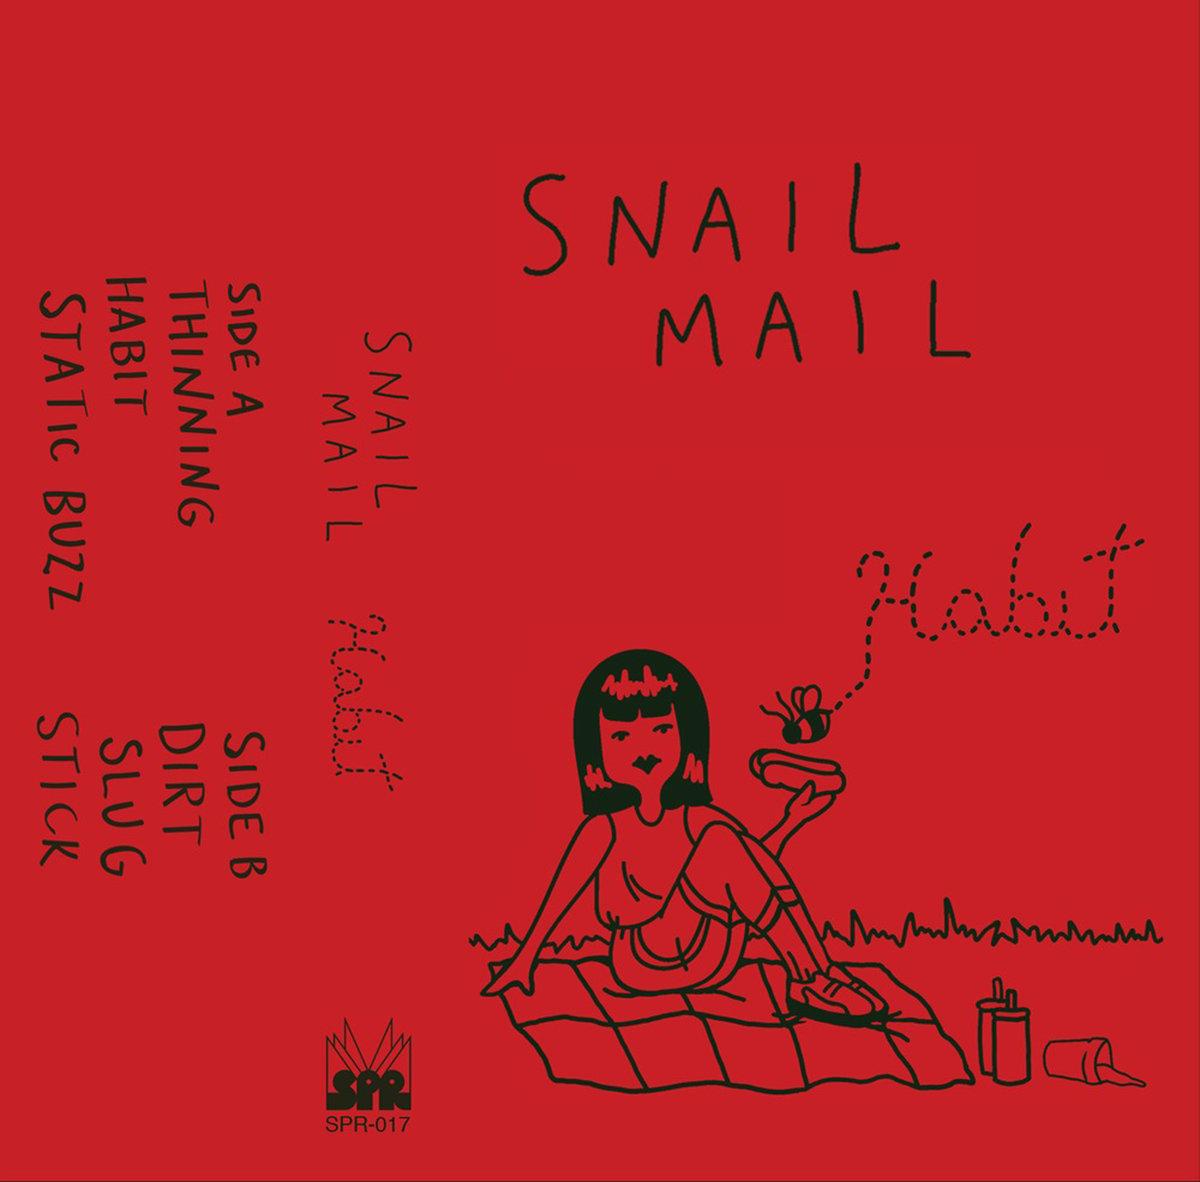 snail mail cover.jpg